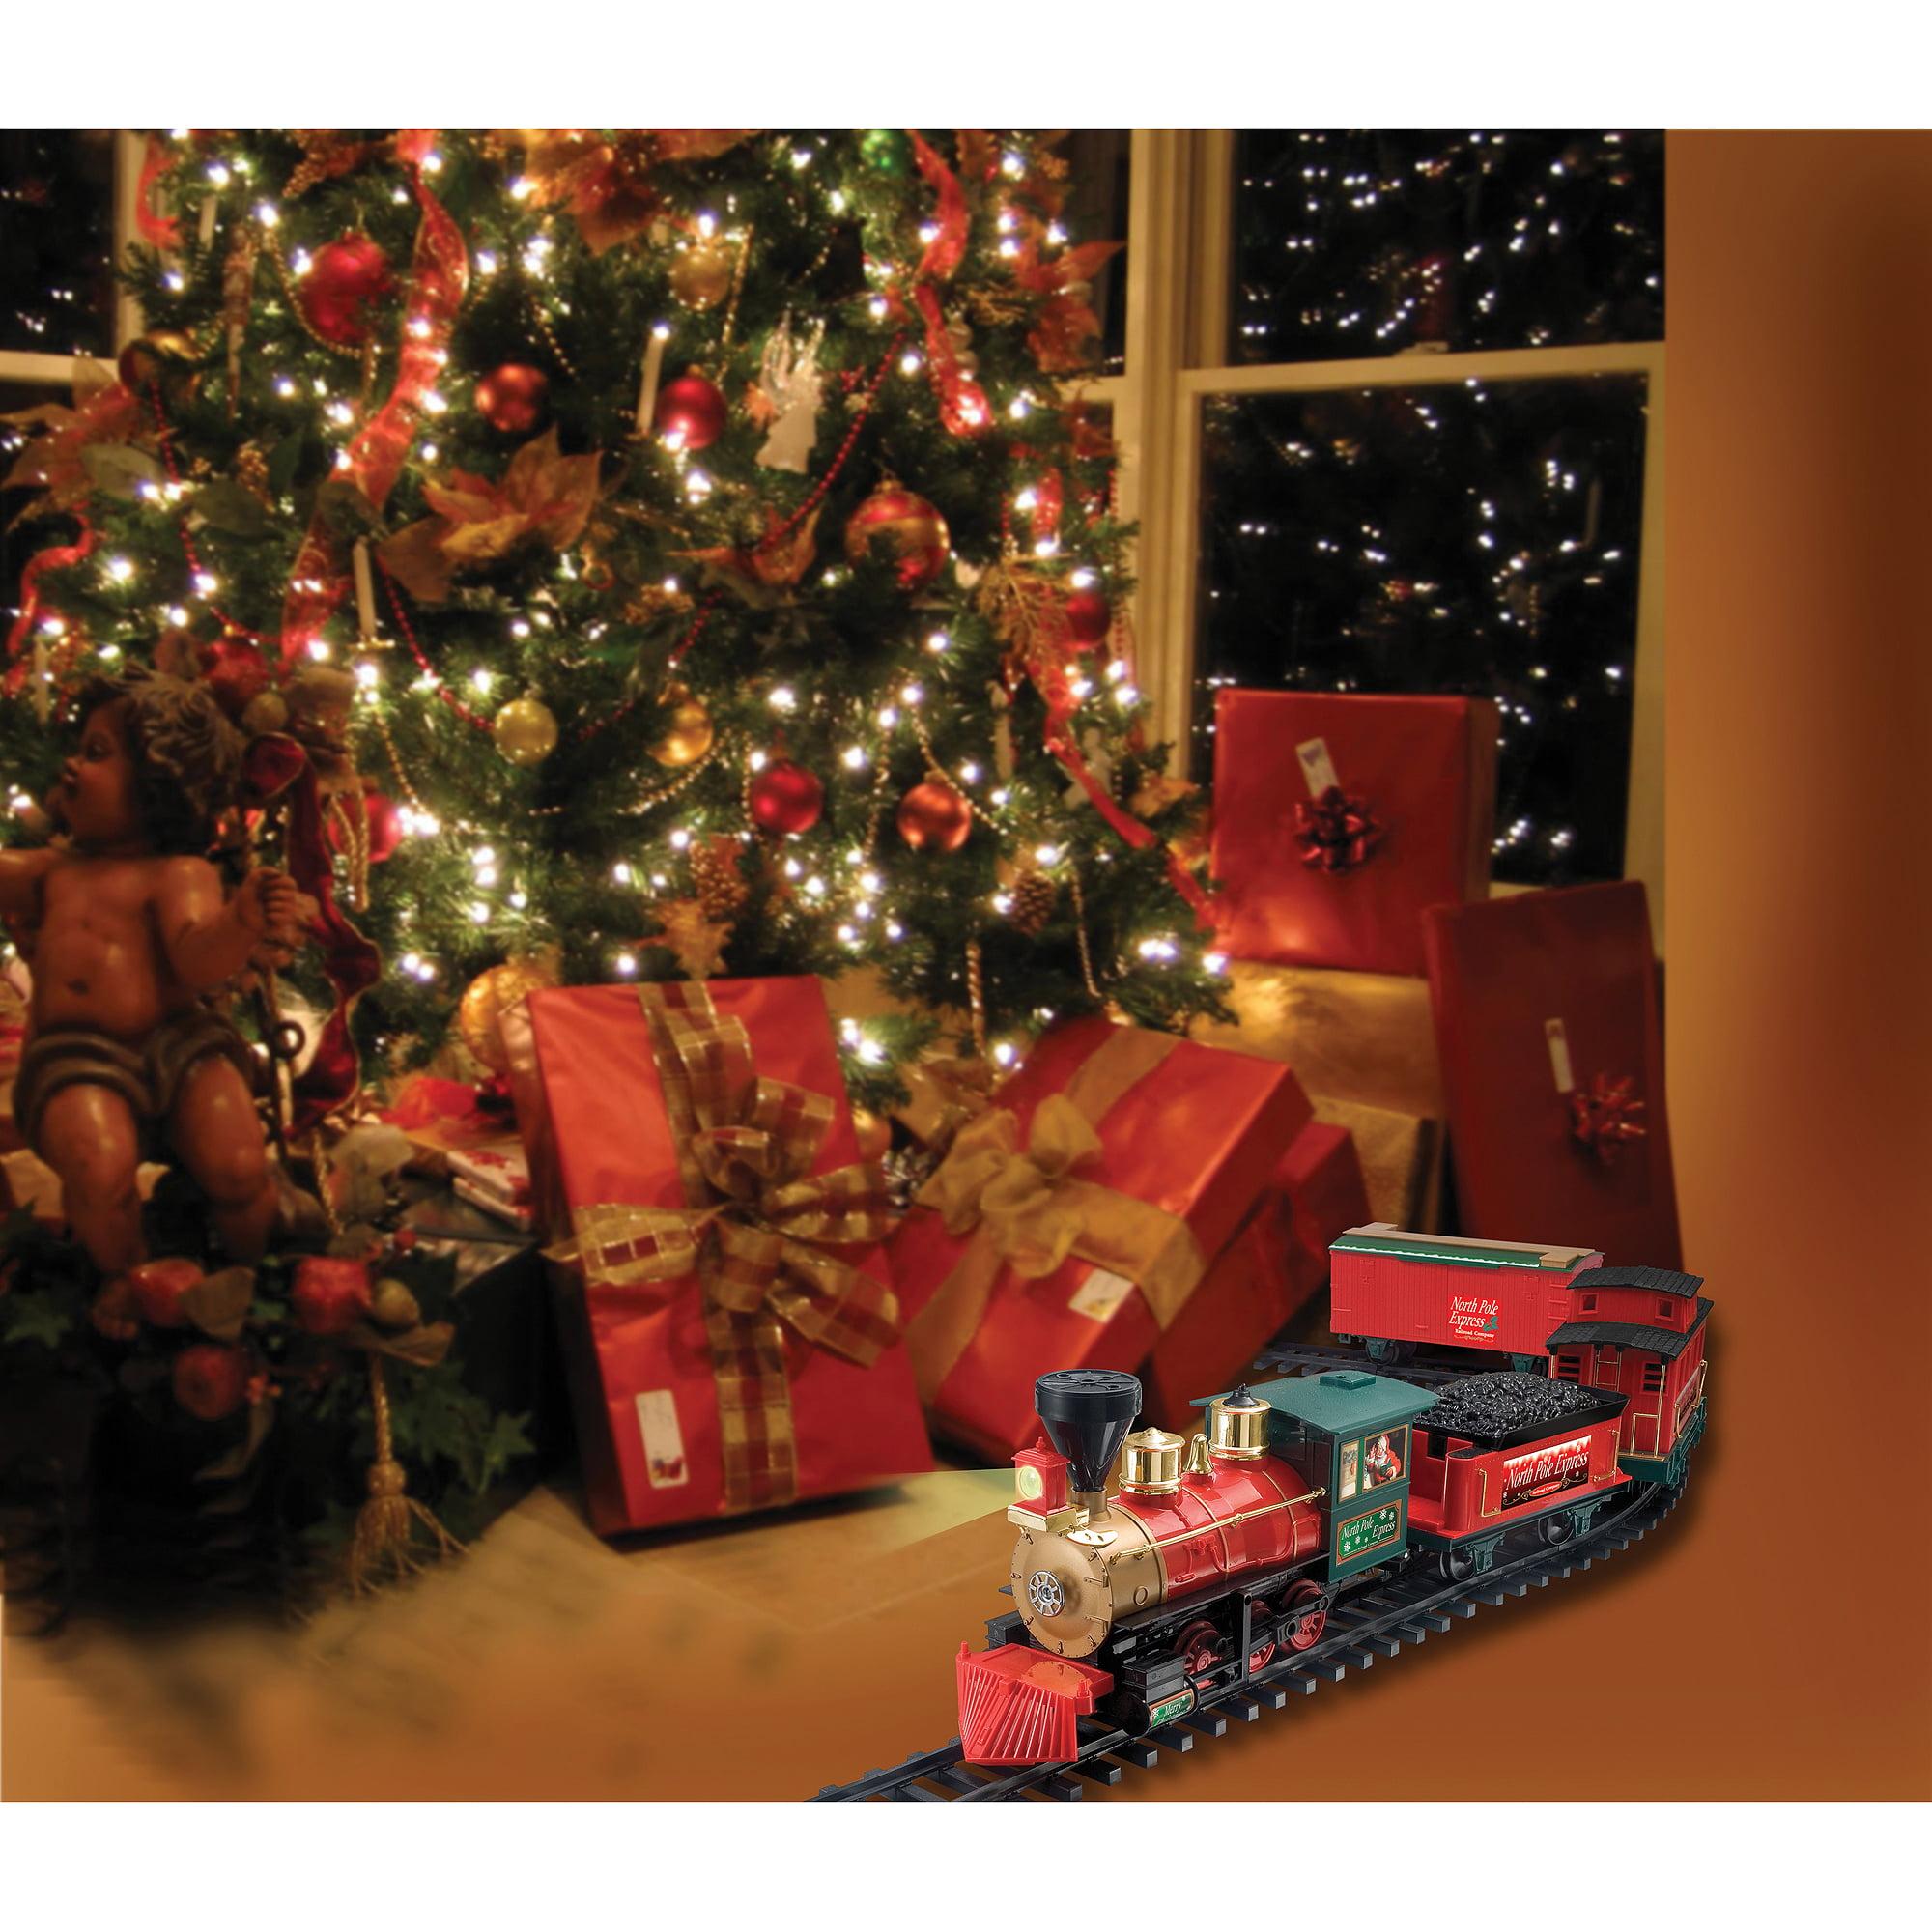 North Pole Express Christmas Train Set, 27 pc - Walmart.com